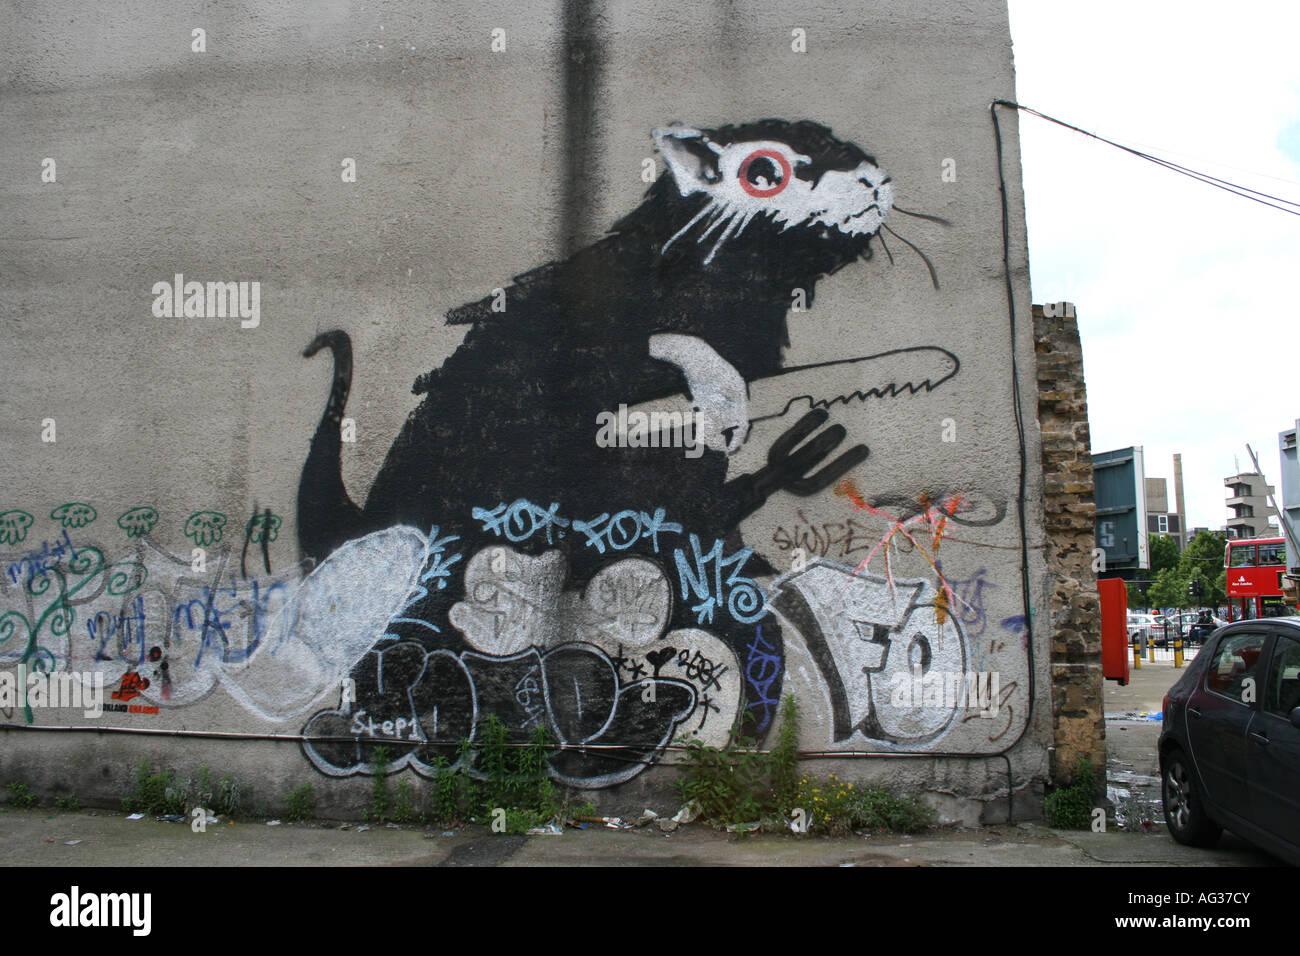 Banksy 'Giant rat' graffiti. London, England - Stock Image